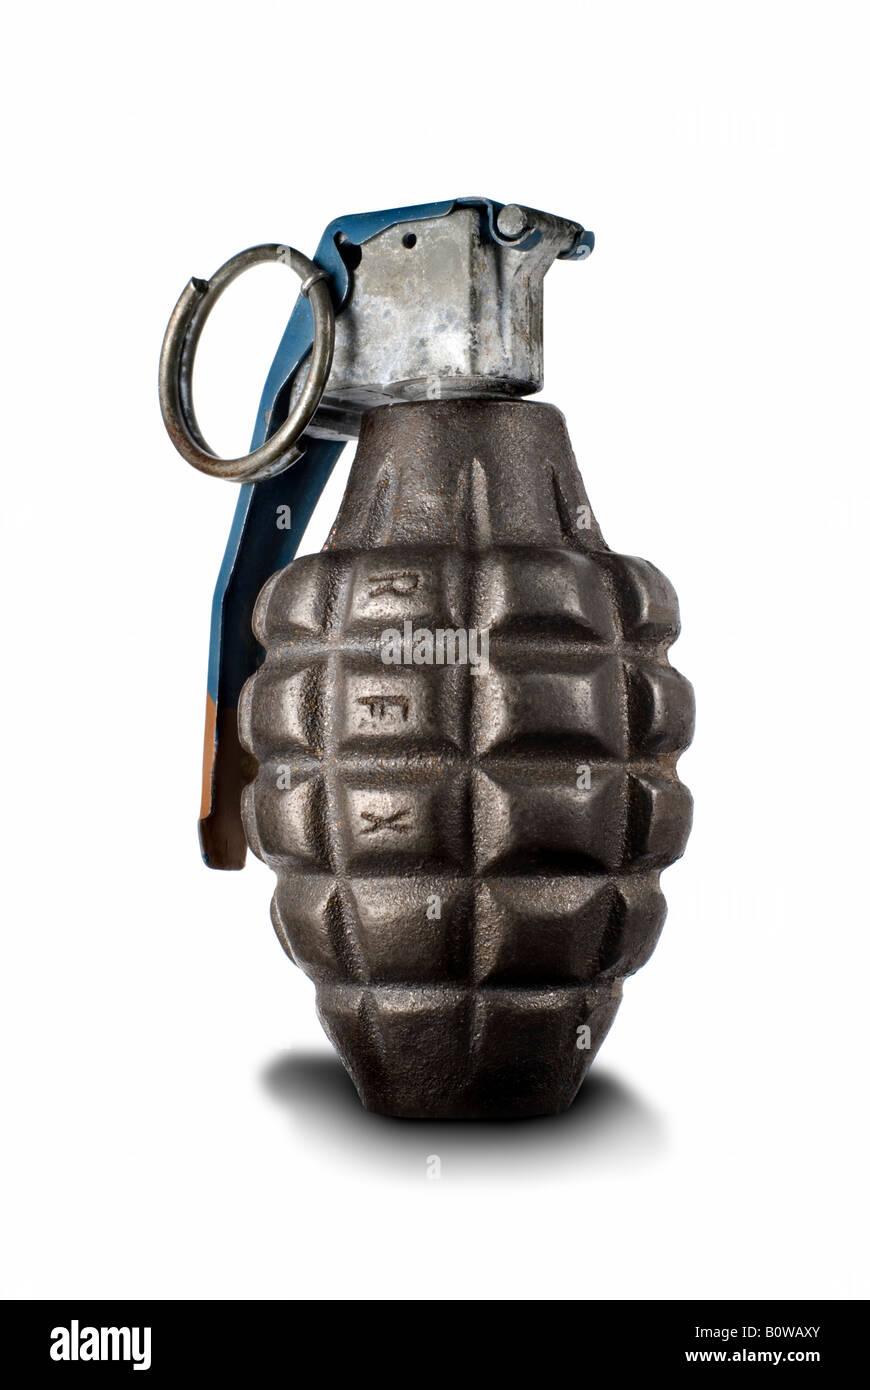 Hand grenade - Stock Image